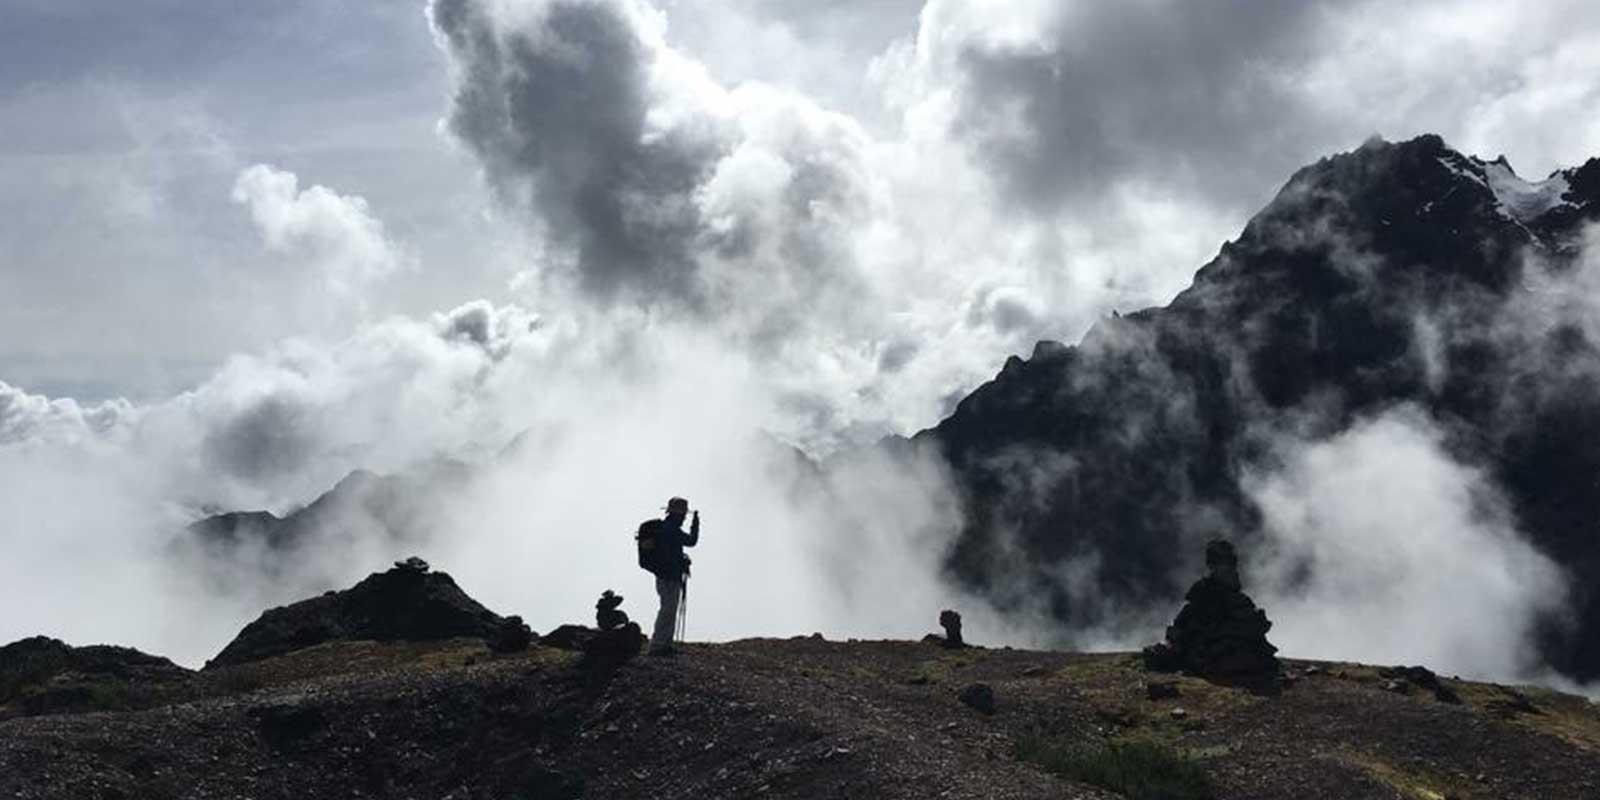 Lares Trek to Machu Picchu 4 Day